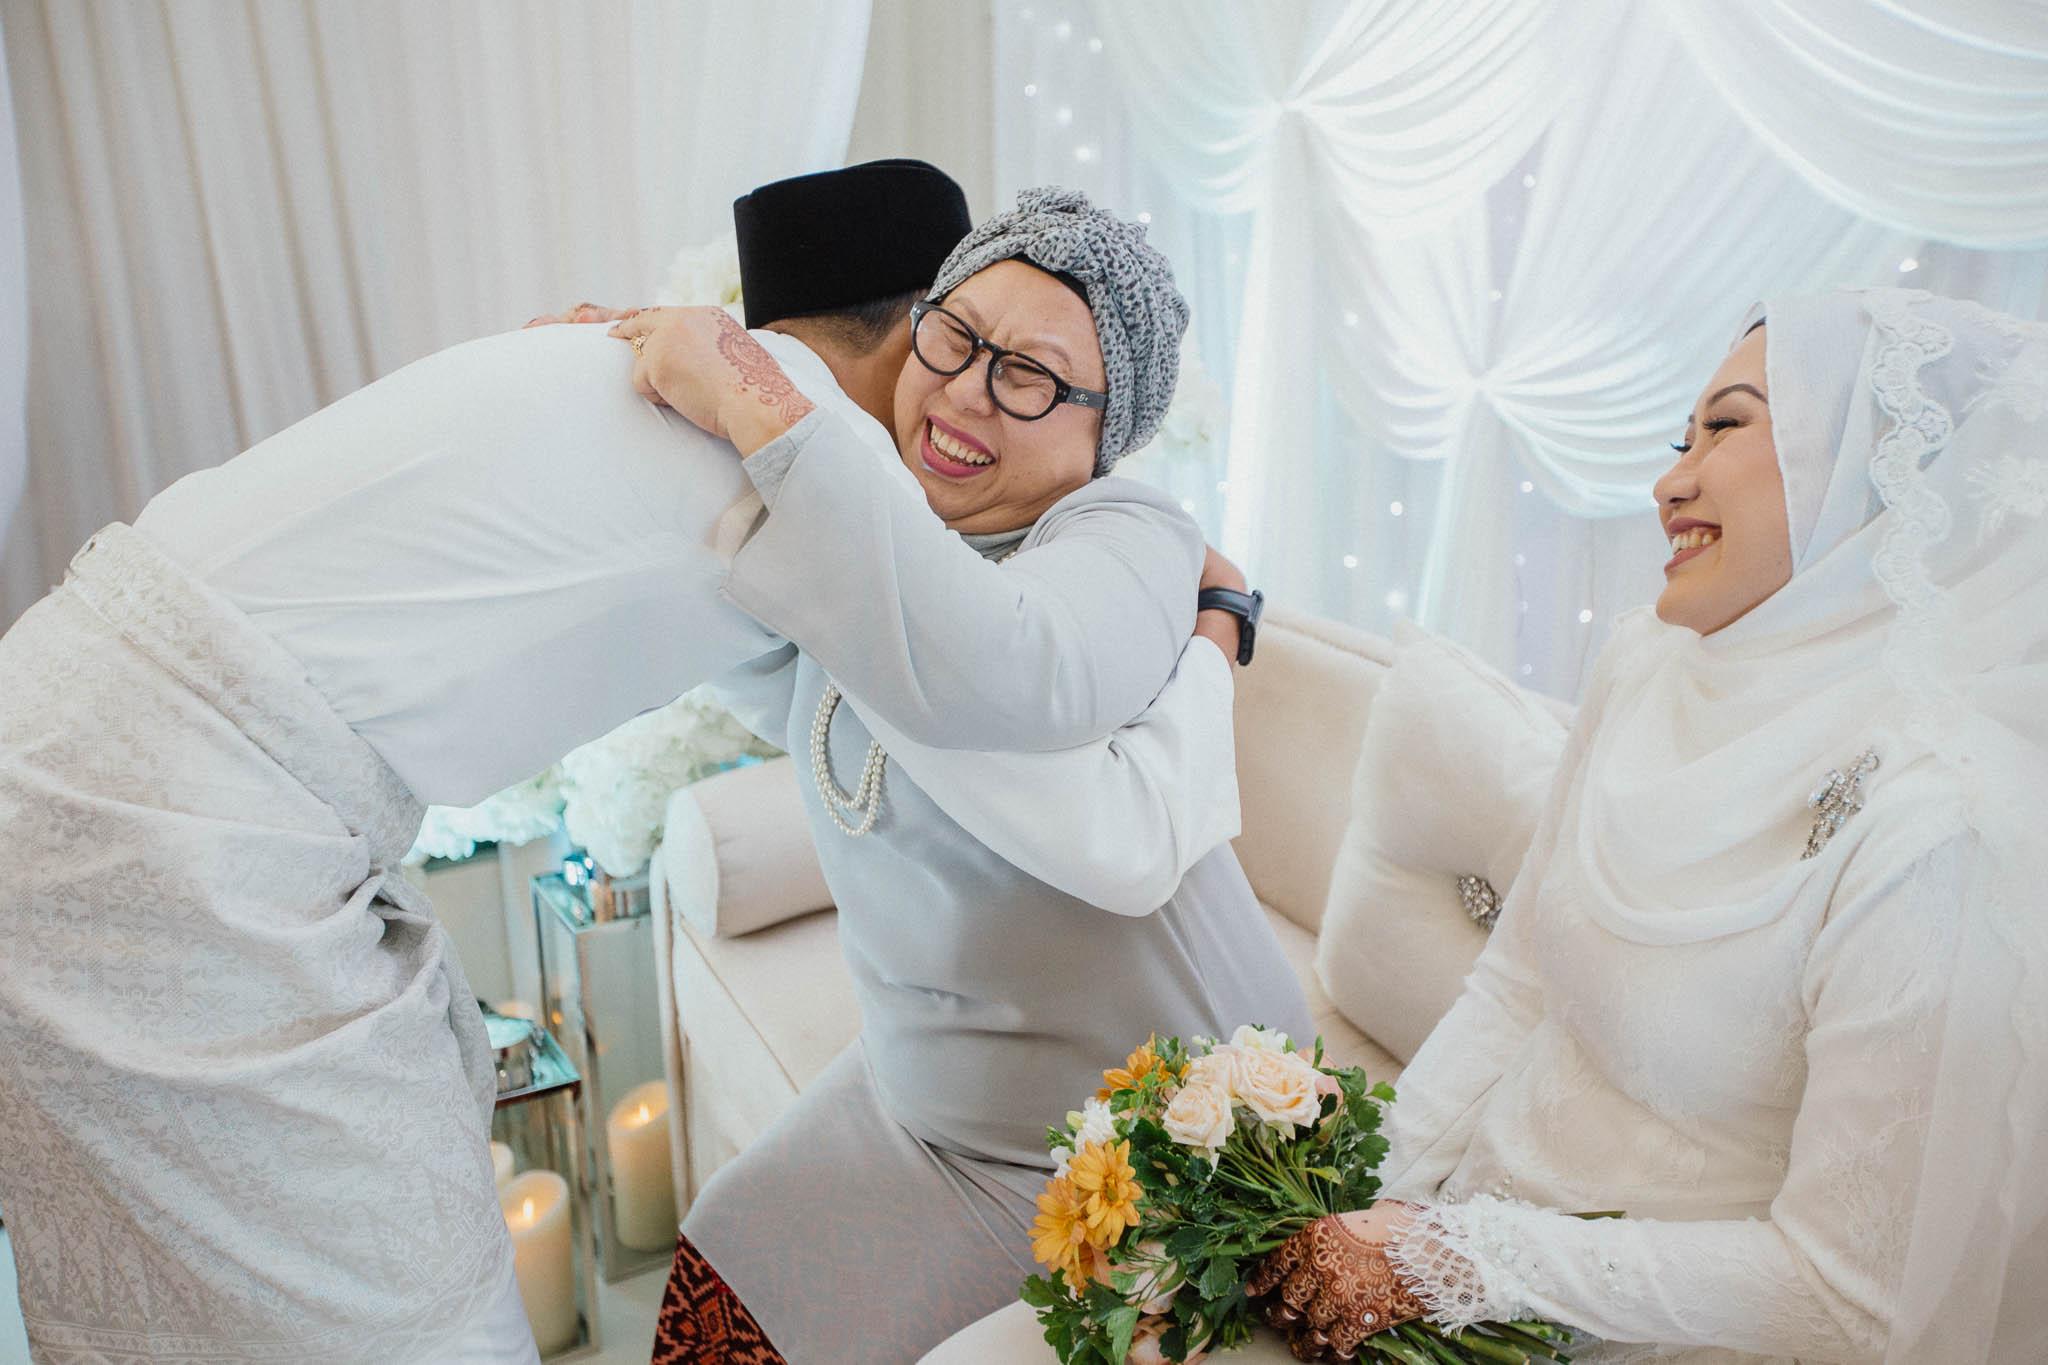 singapore-wedding-photographer-addafiq-nufail-024.jpg